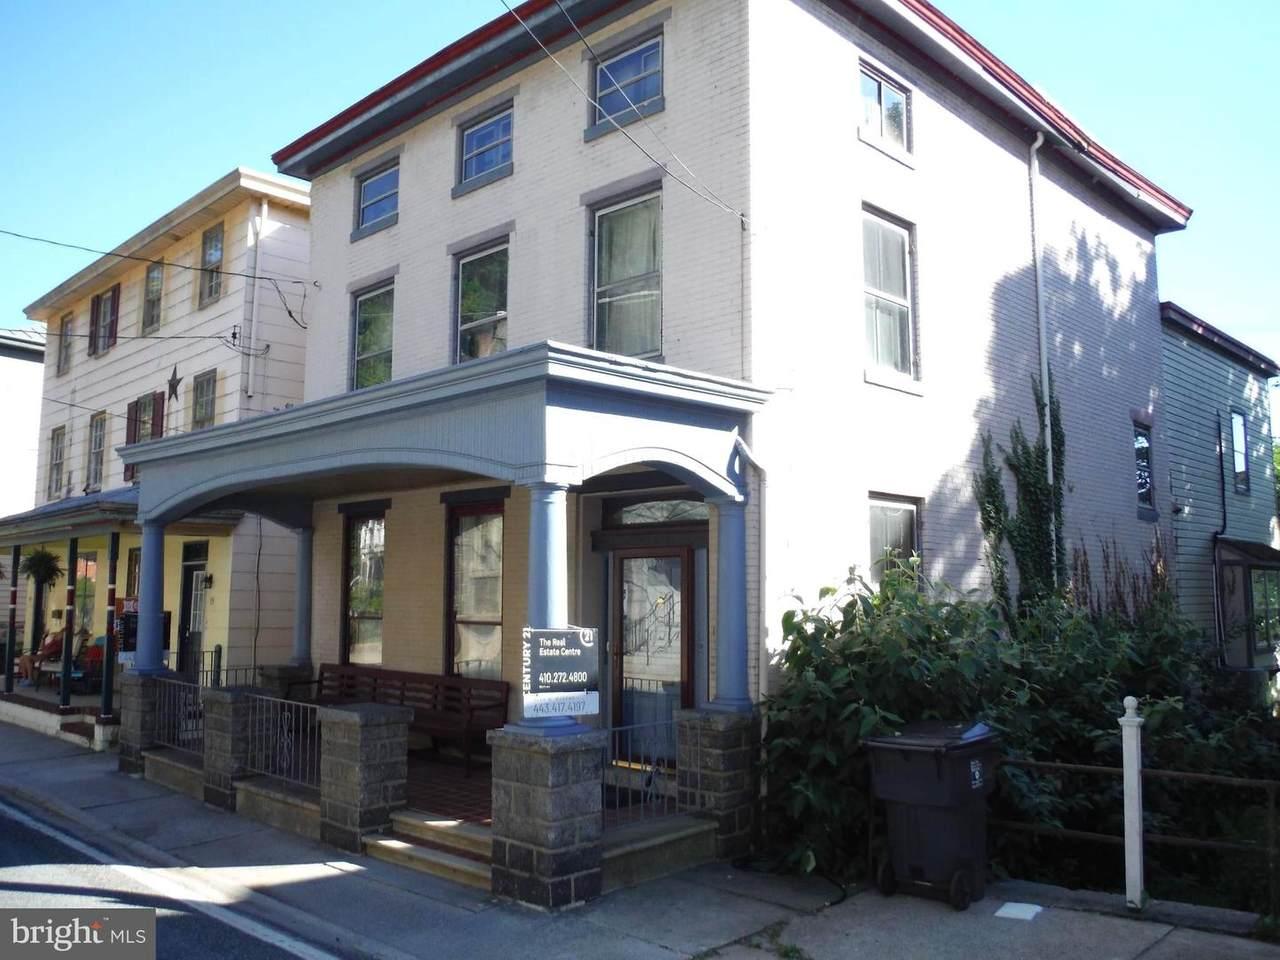 37 Main Street - Photo 1